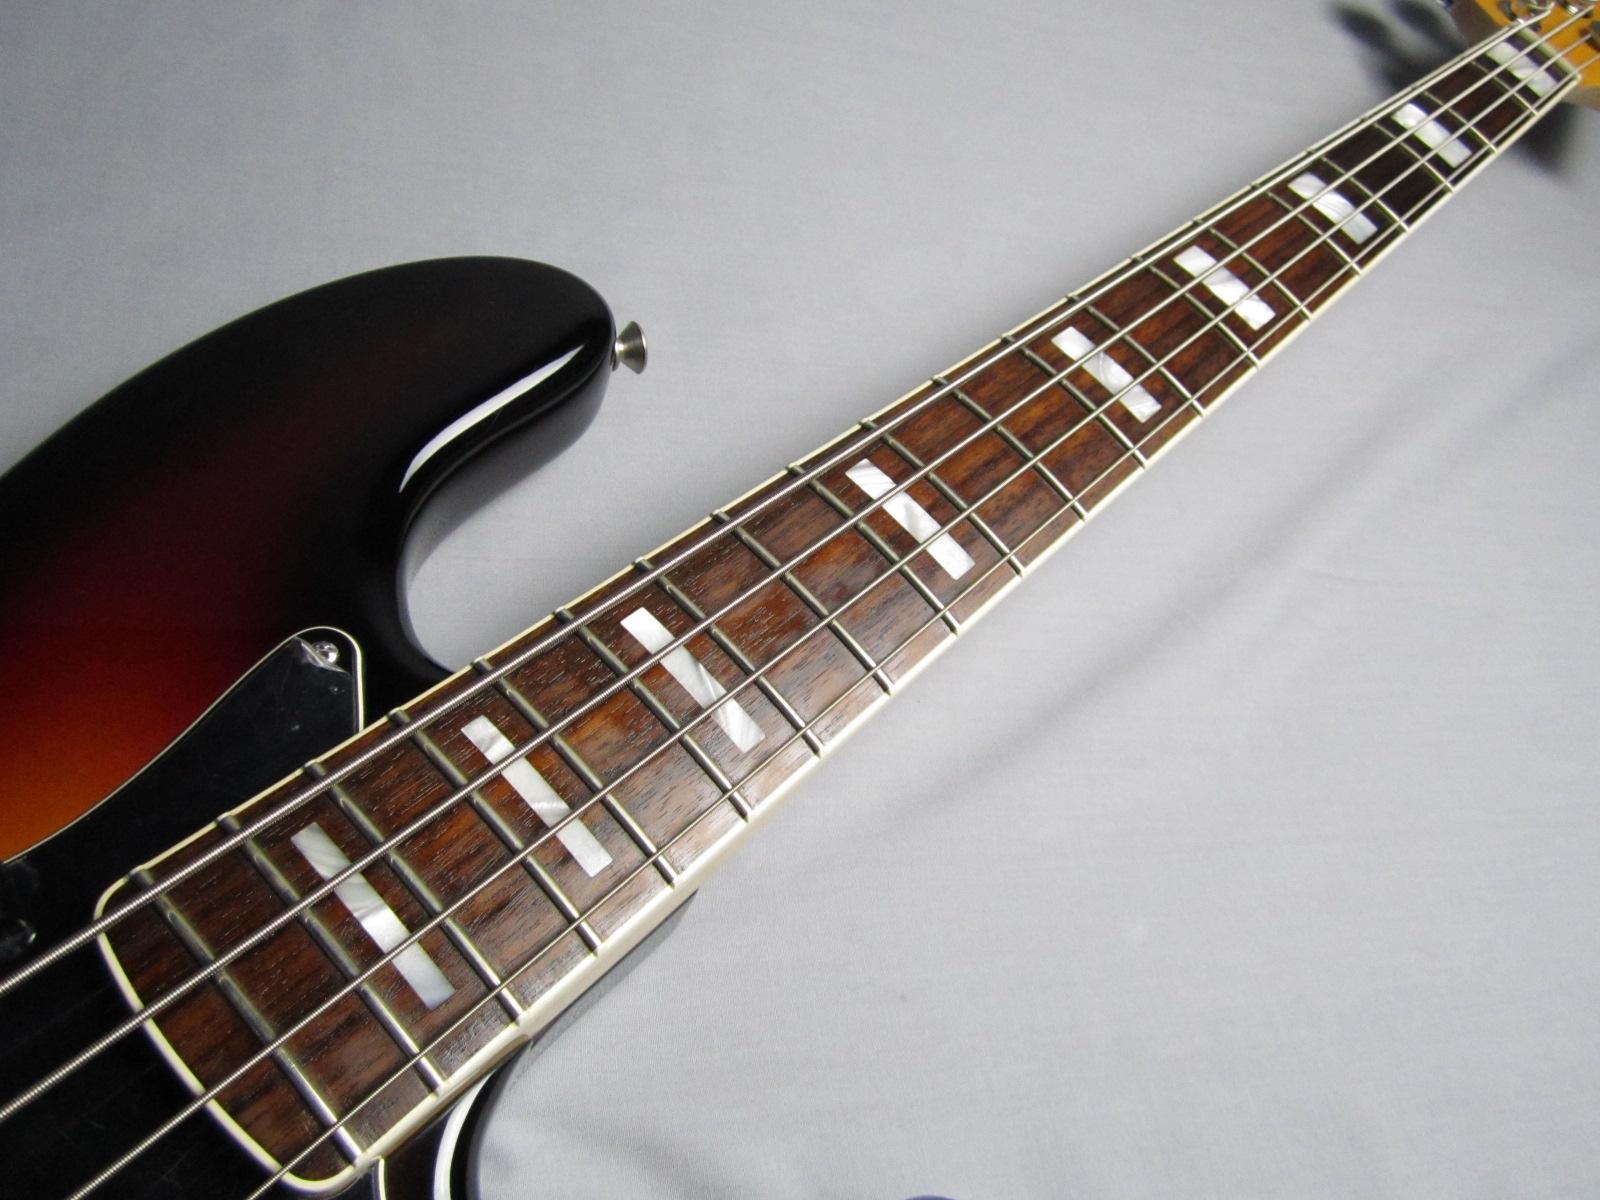 American Vintage '74 Jazz Bass / Rosewoodの指板画像